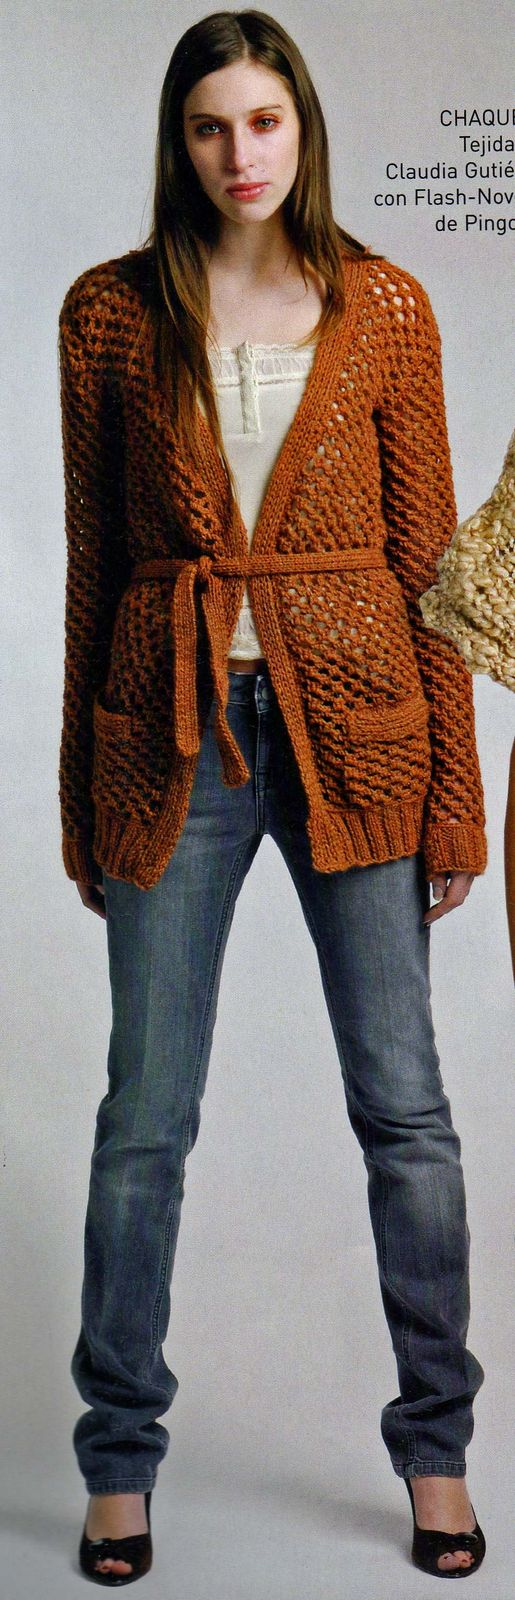 Patrones – Chaqueta Crochet Larga – Cardigan Ganchillo – Comando Craft